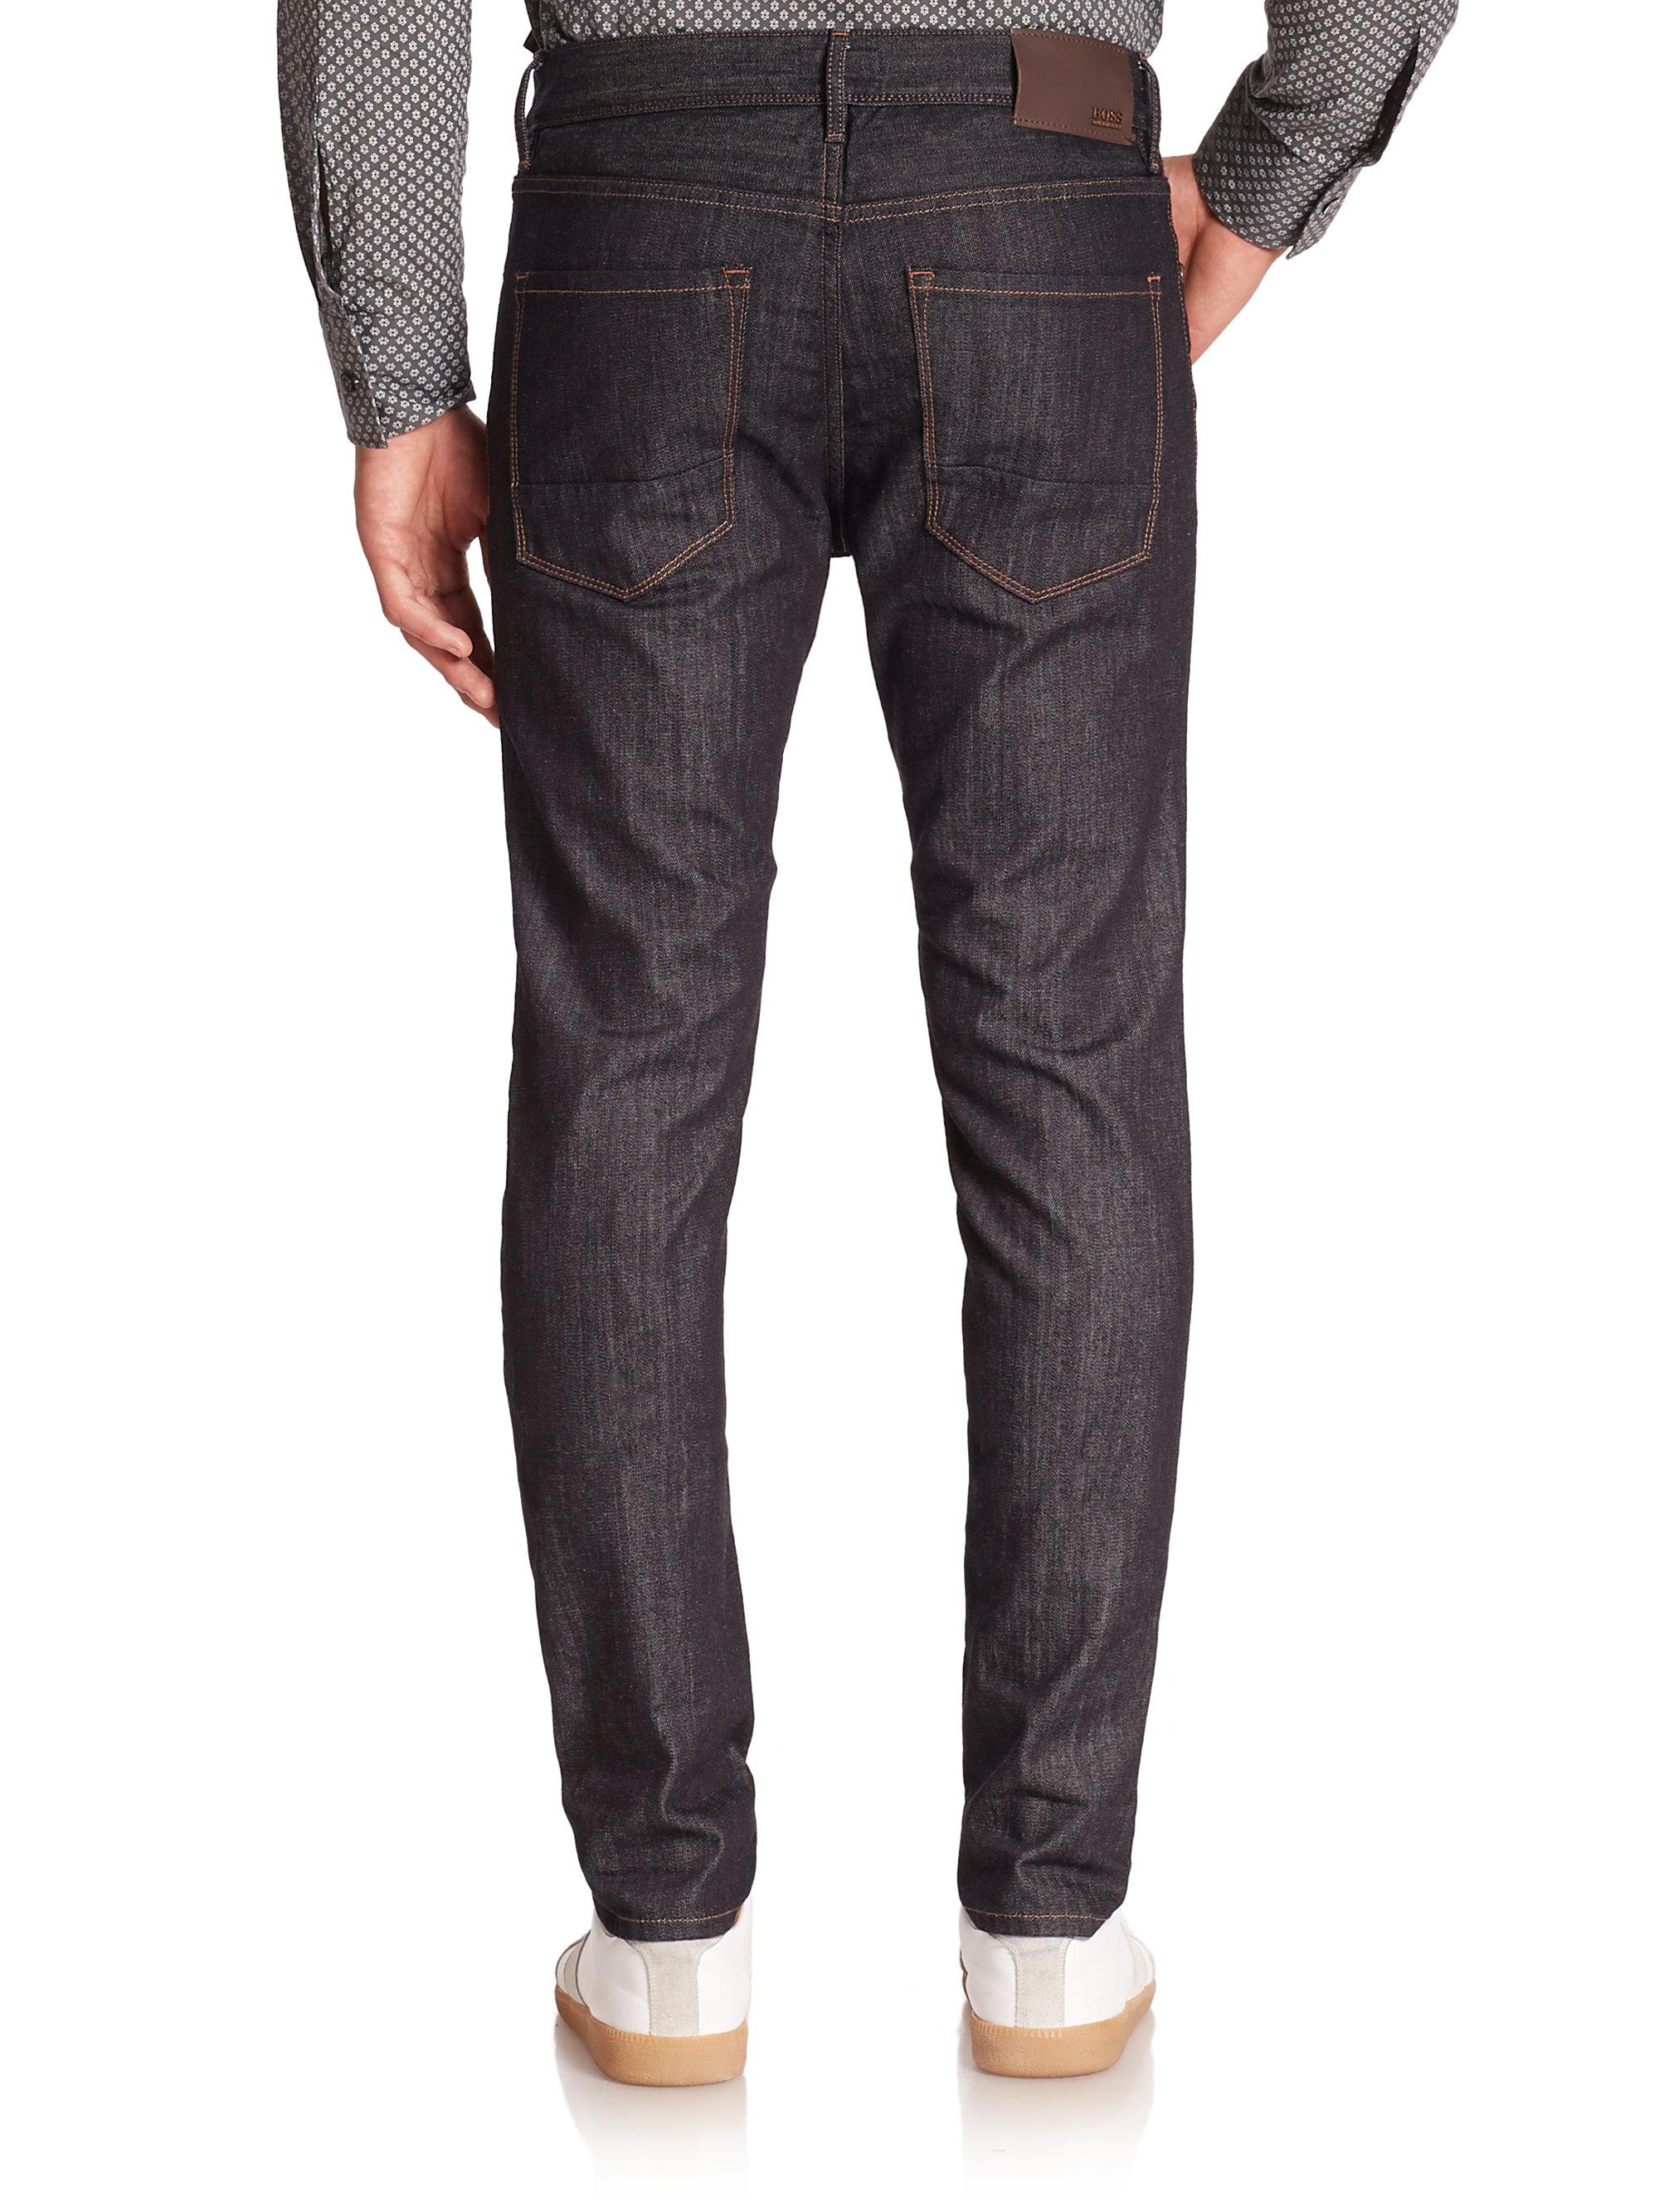 boss charleston stretch slim fit jeans in blue for men. Black Bedroom Furniture Sets. Home Design Ideas